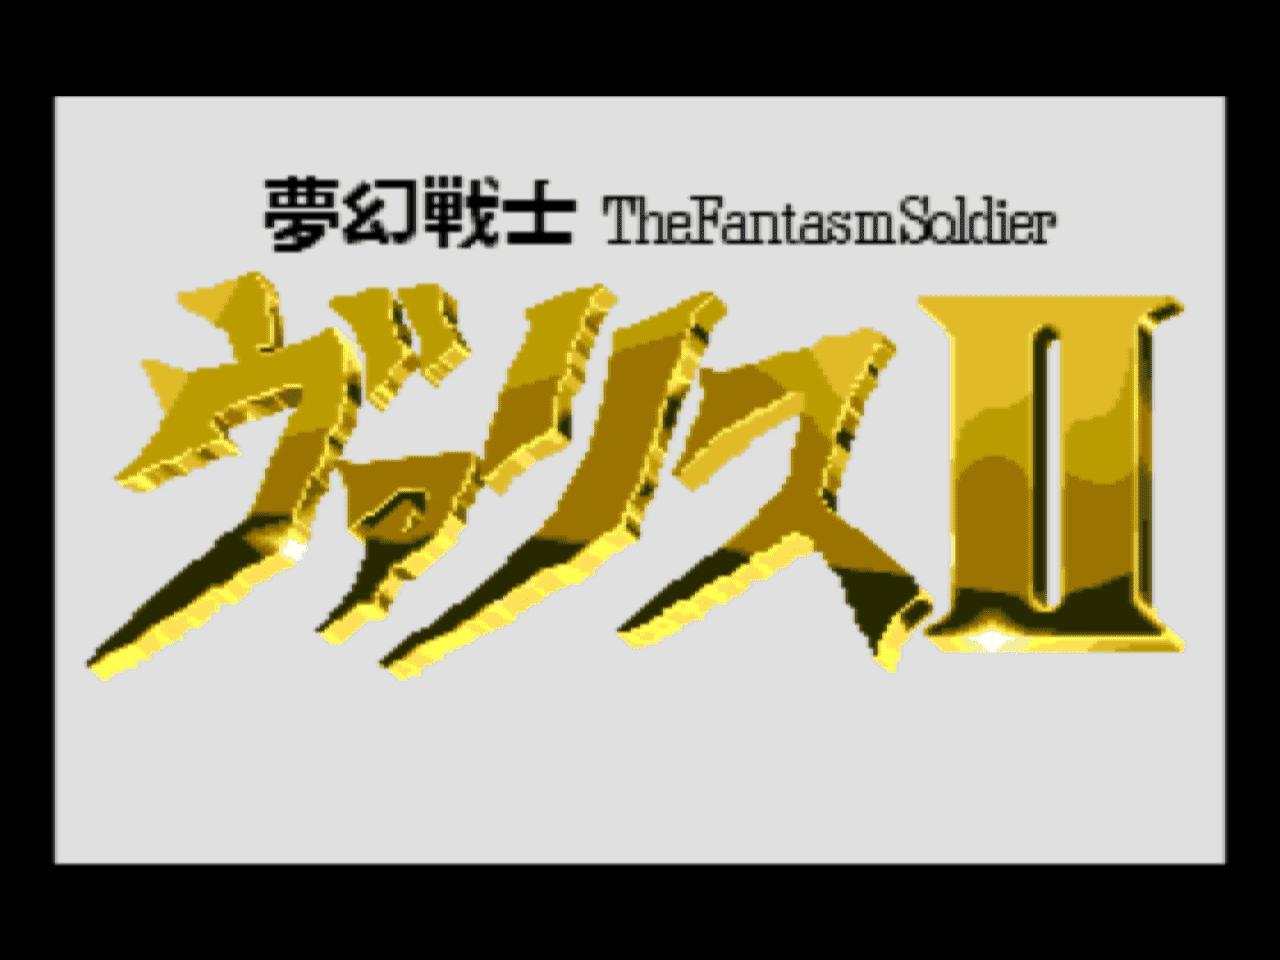 Fantasm Soldier Valis 2